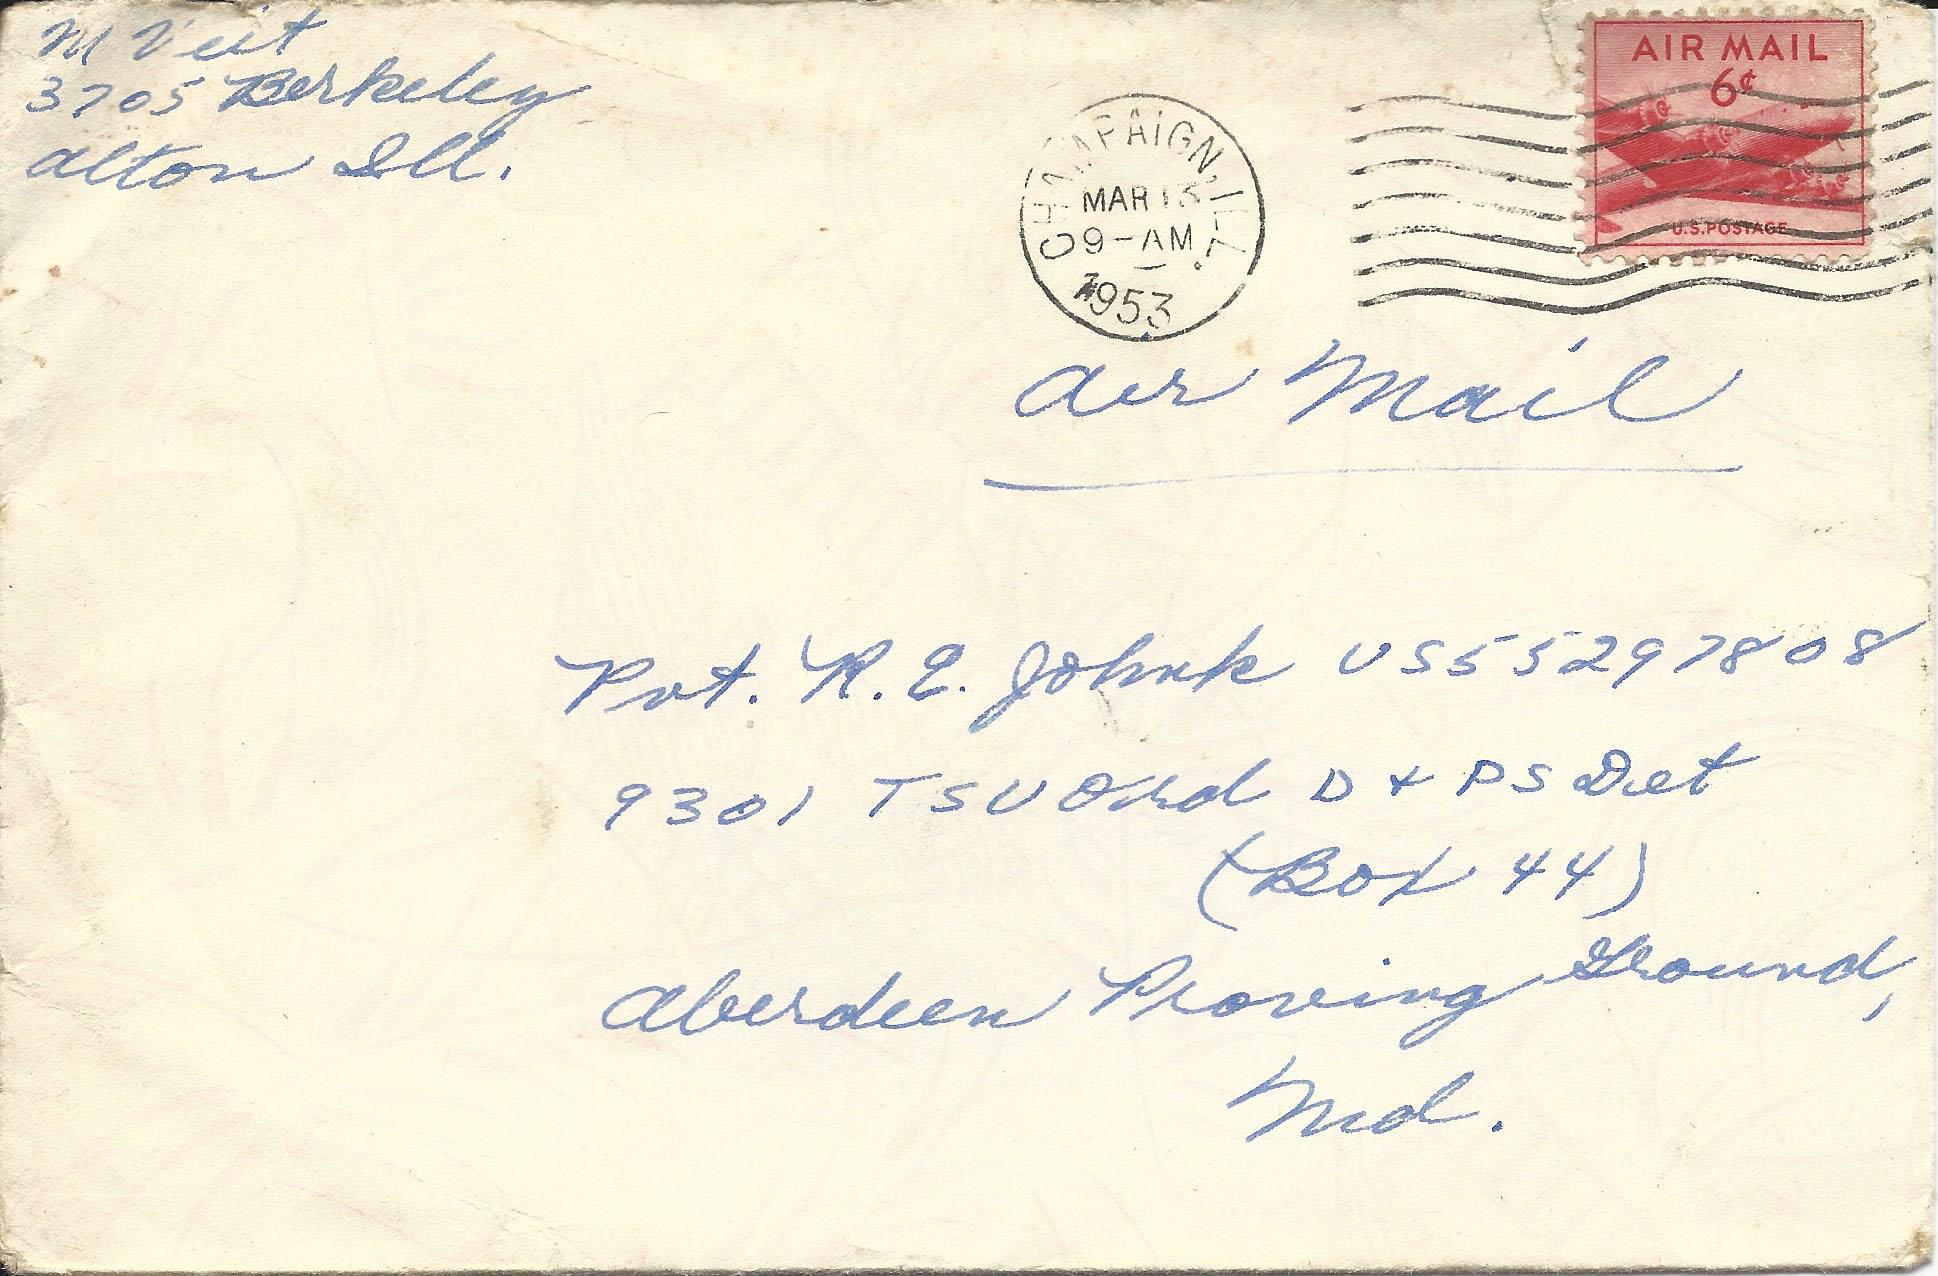 Mar. 12, 1953 (Marj) Envelope